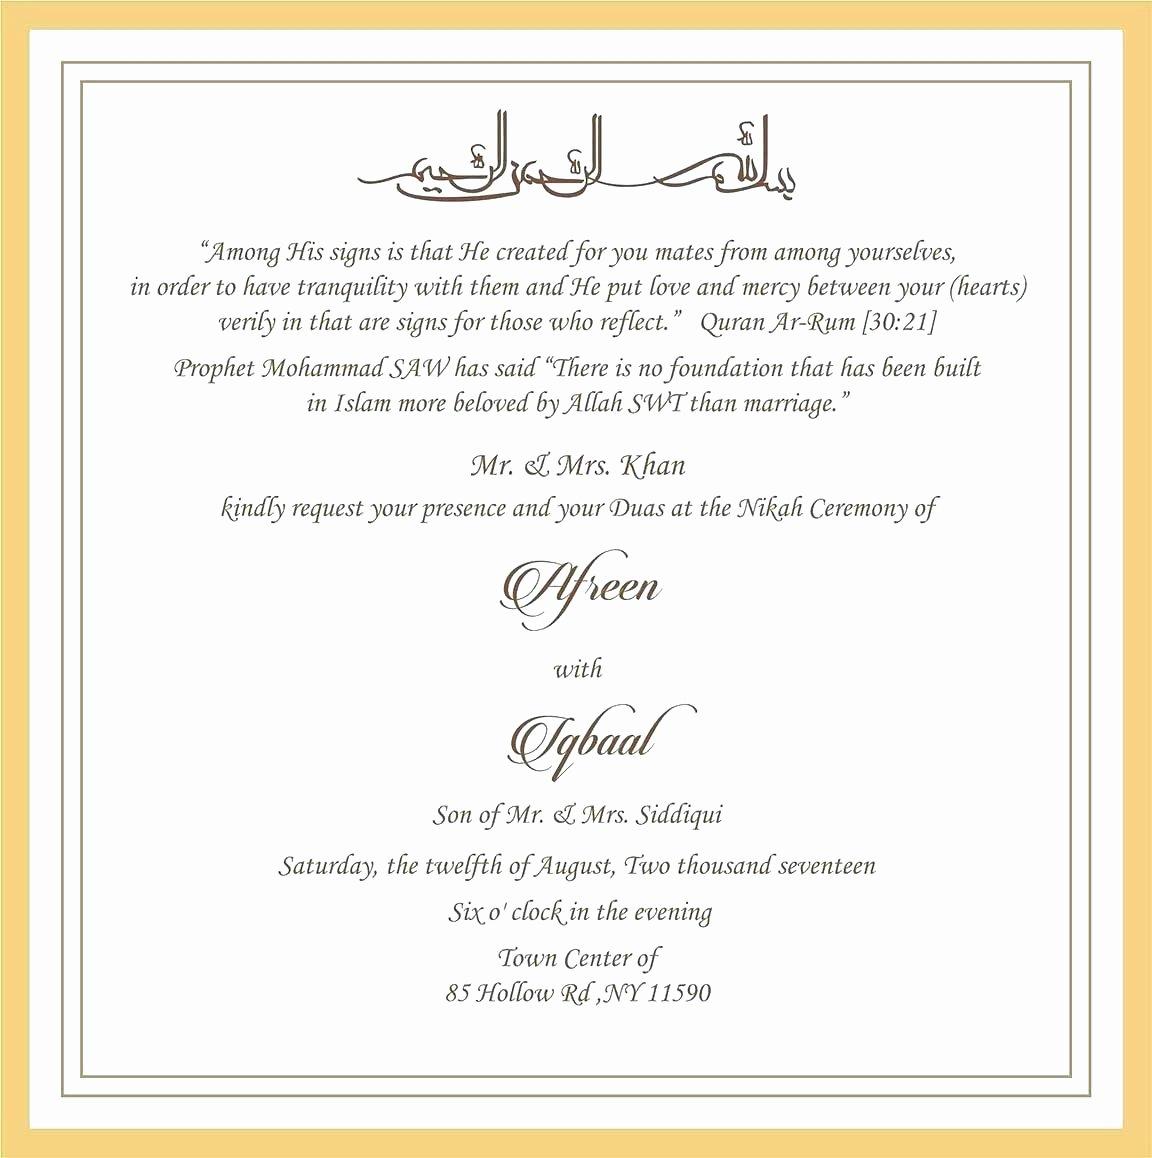 Memorial Service Invitation Template Luxury Memorial Service Invitation Sample formal Invitation